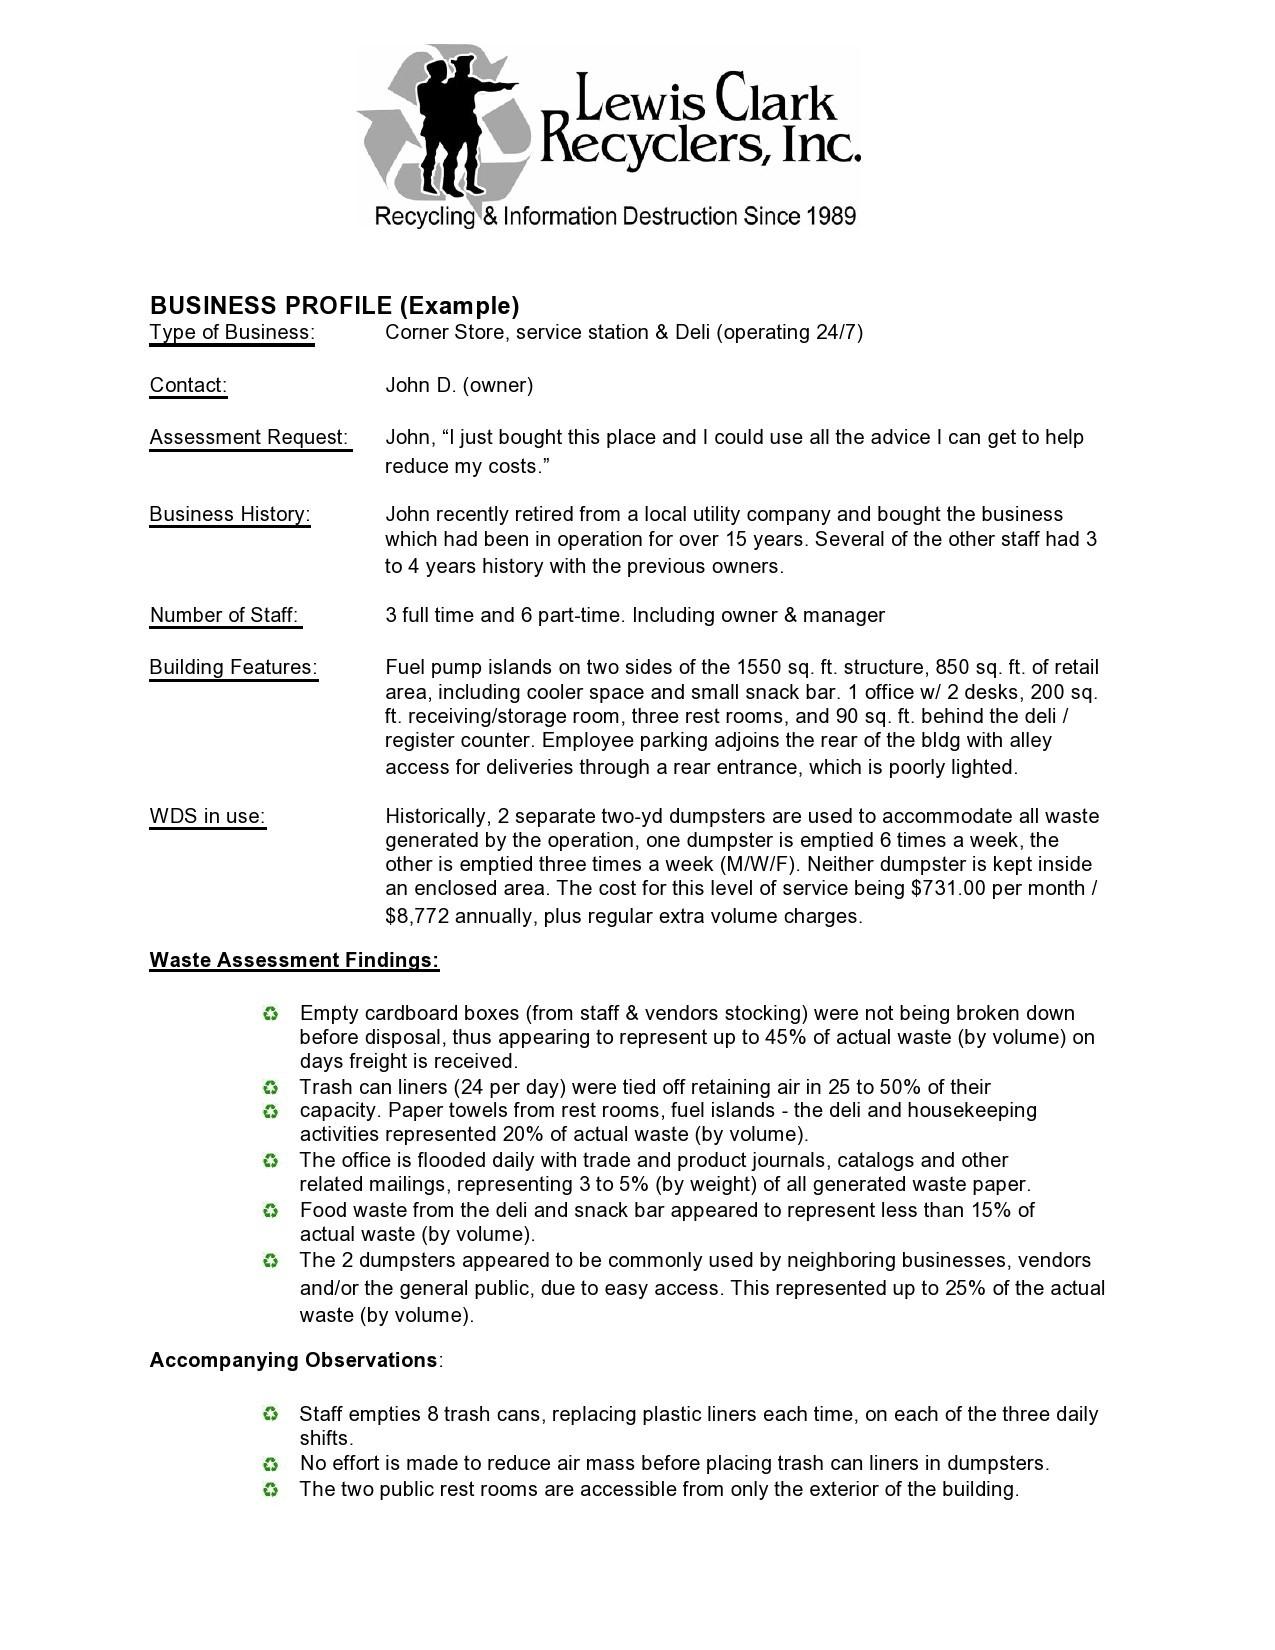 Free company profile template 02